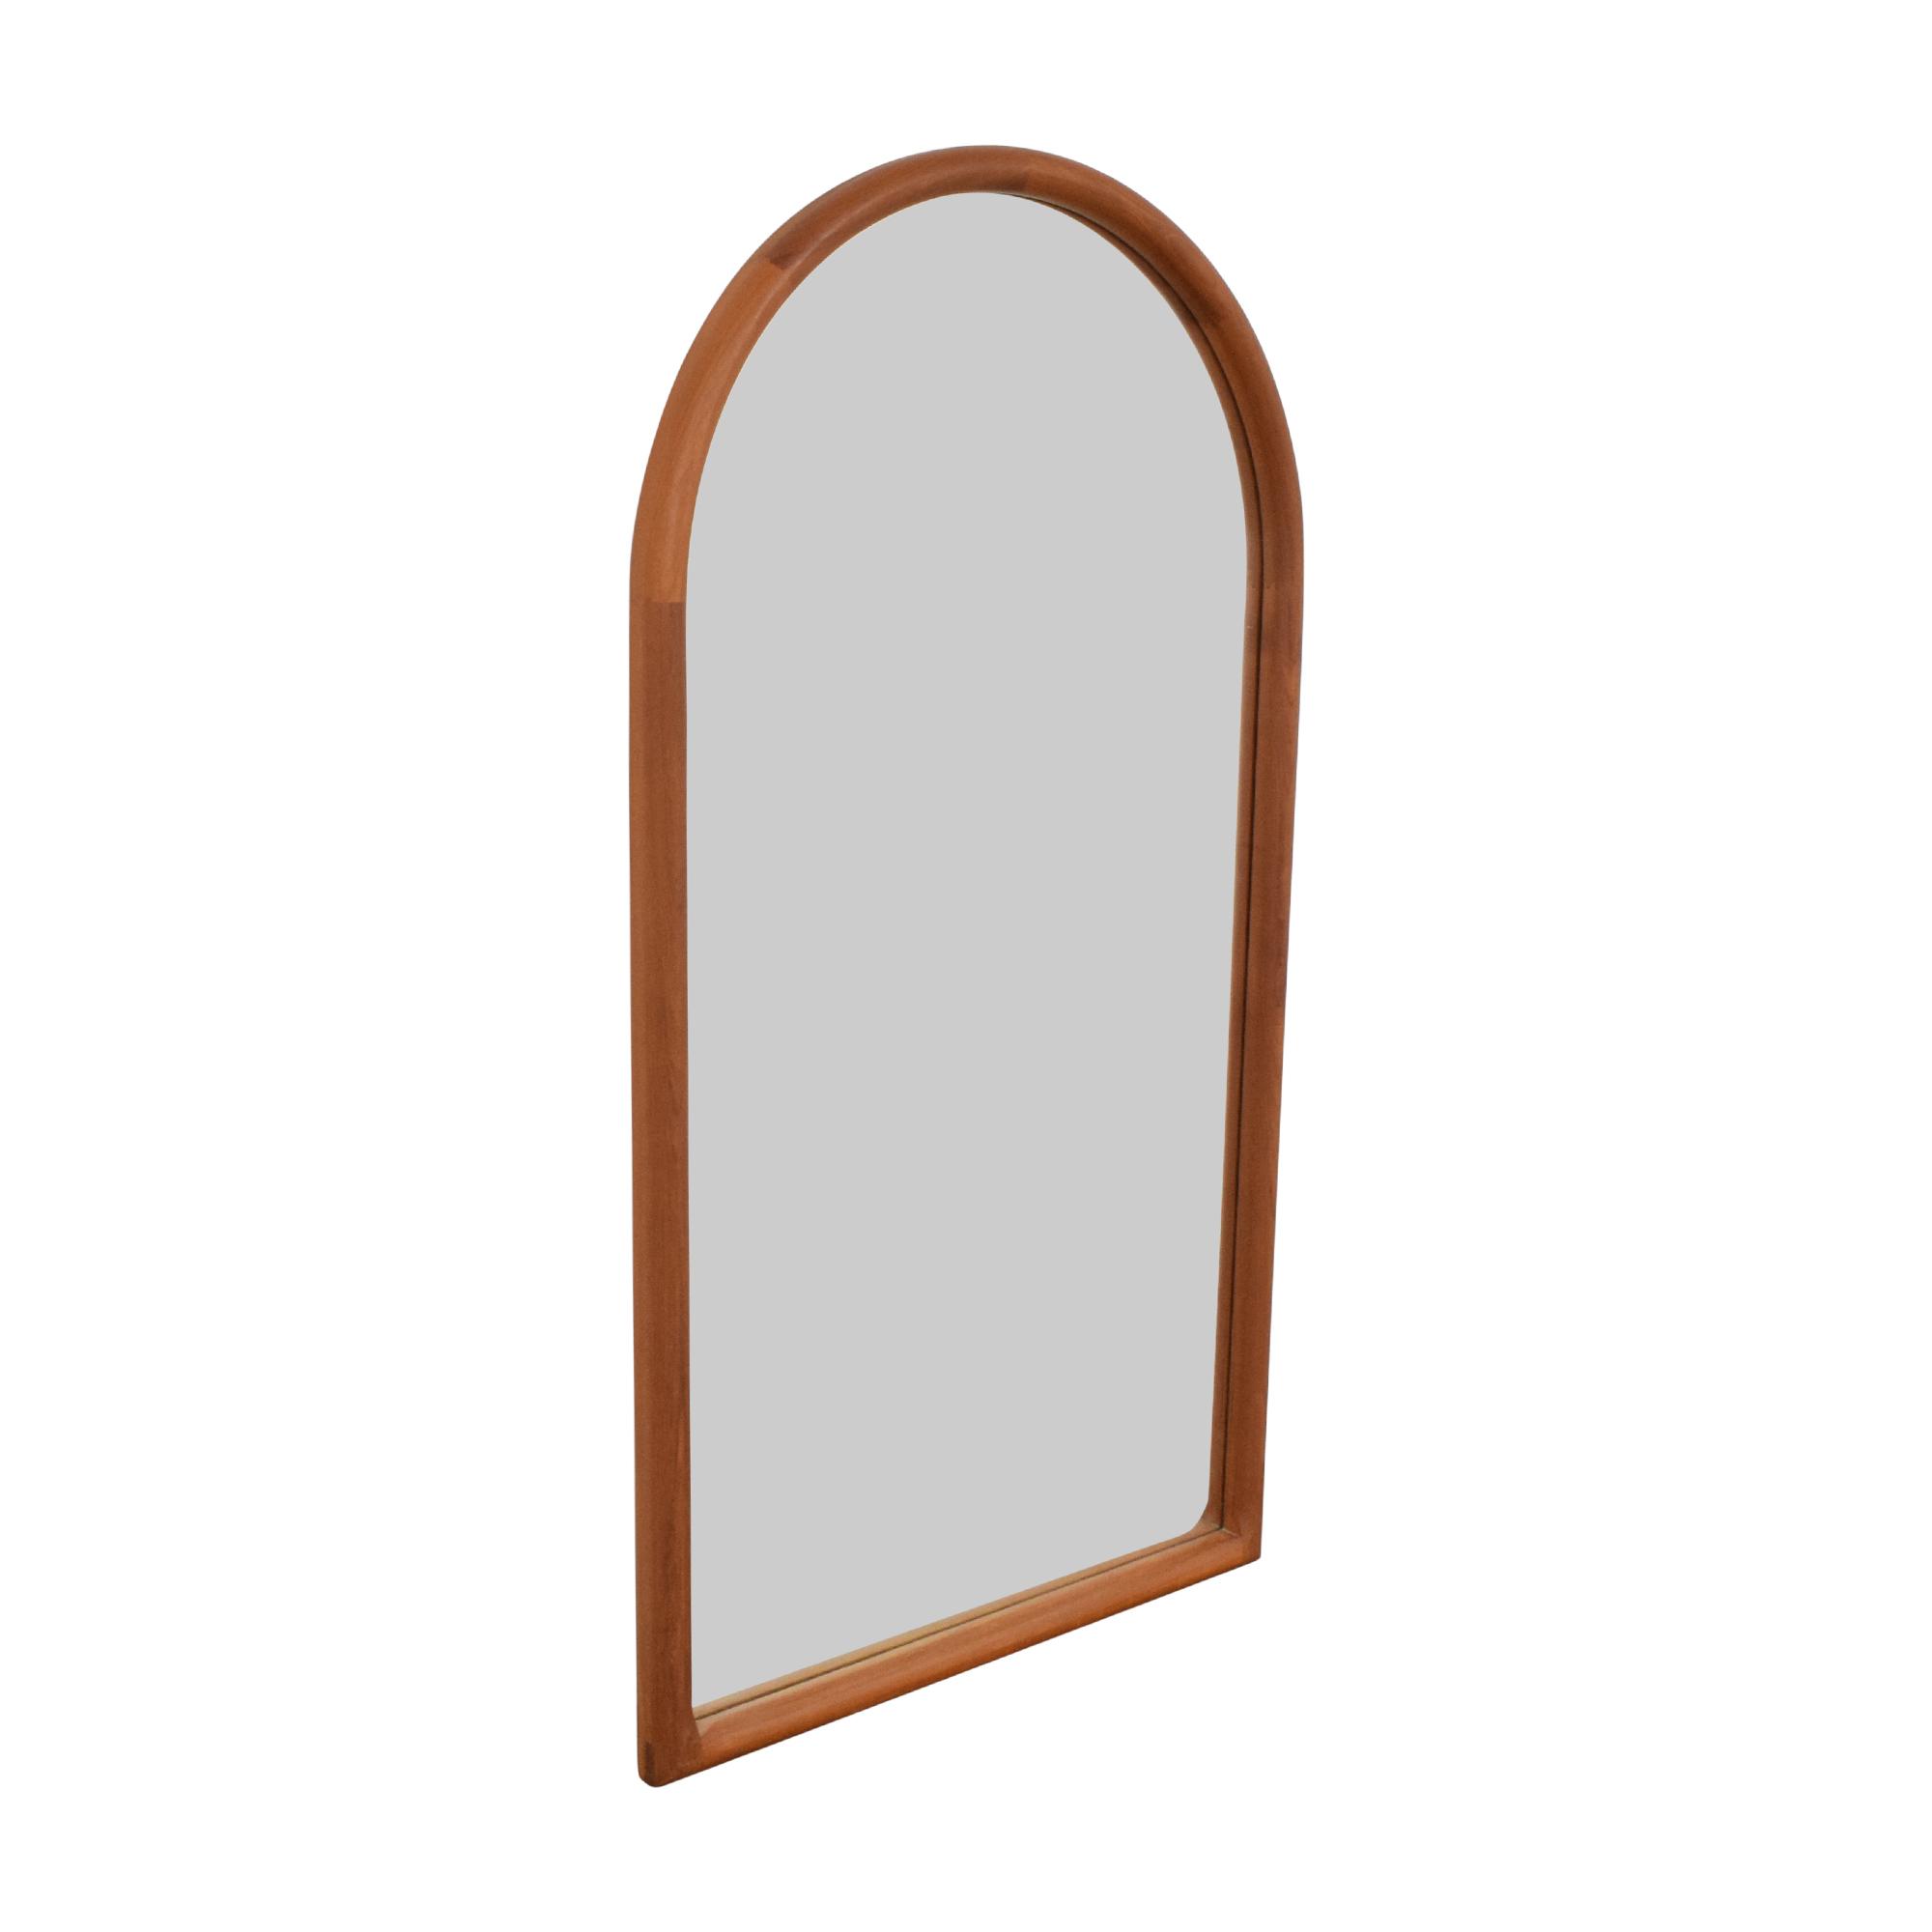 buy Vildbjerg Mobelfrabrik Arched Mirror Vildbjerg Mobelfrabrik Decor